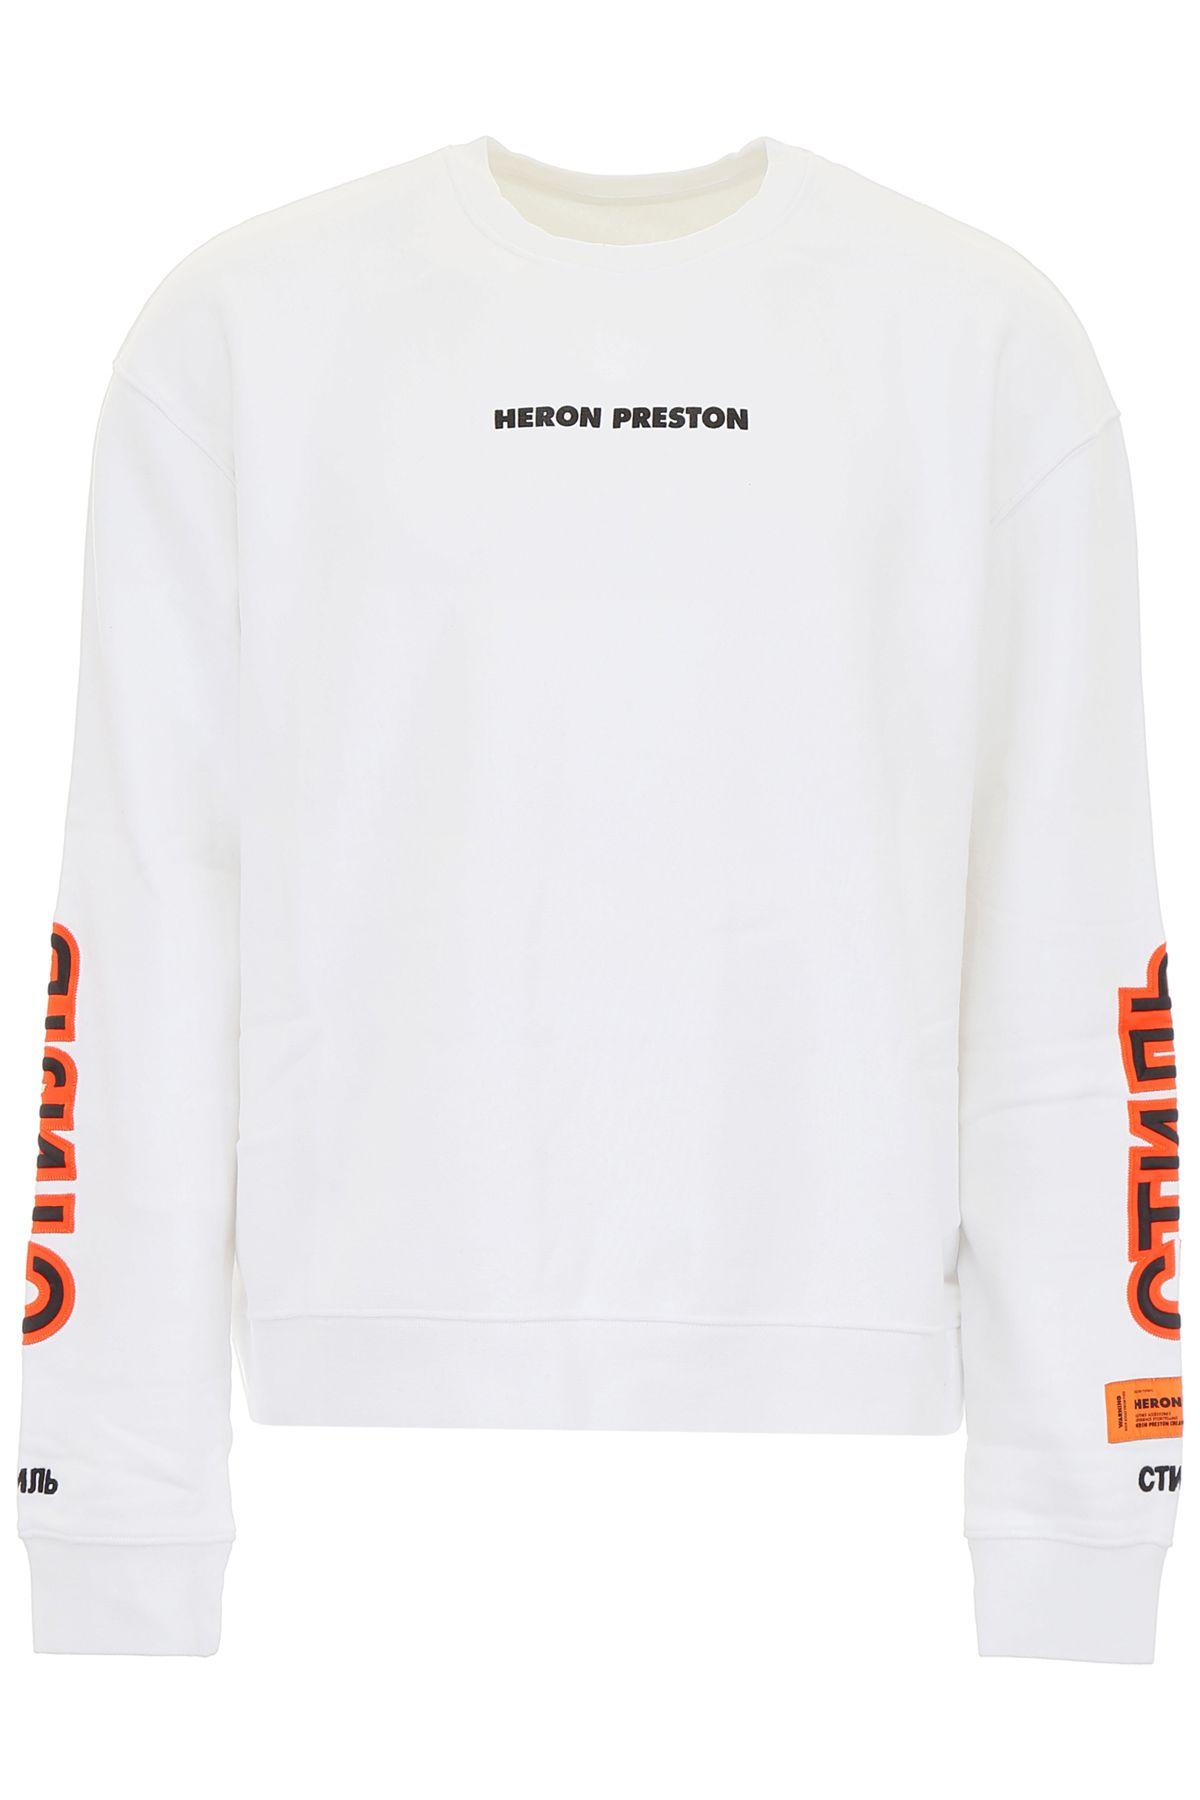 HERON PRESTON Style Sweatshirt